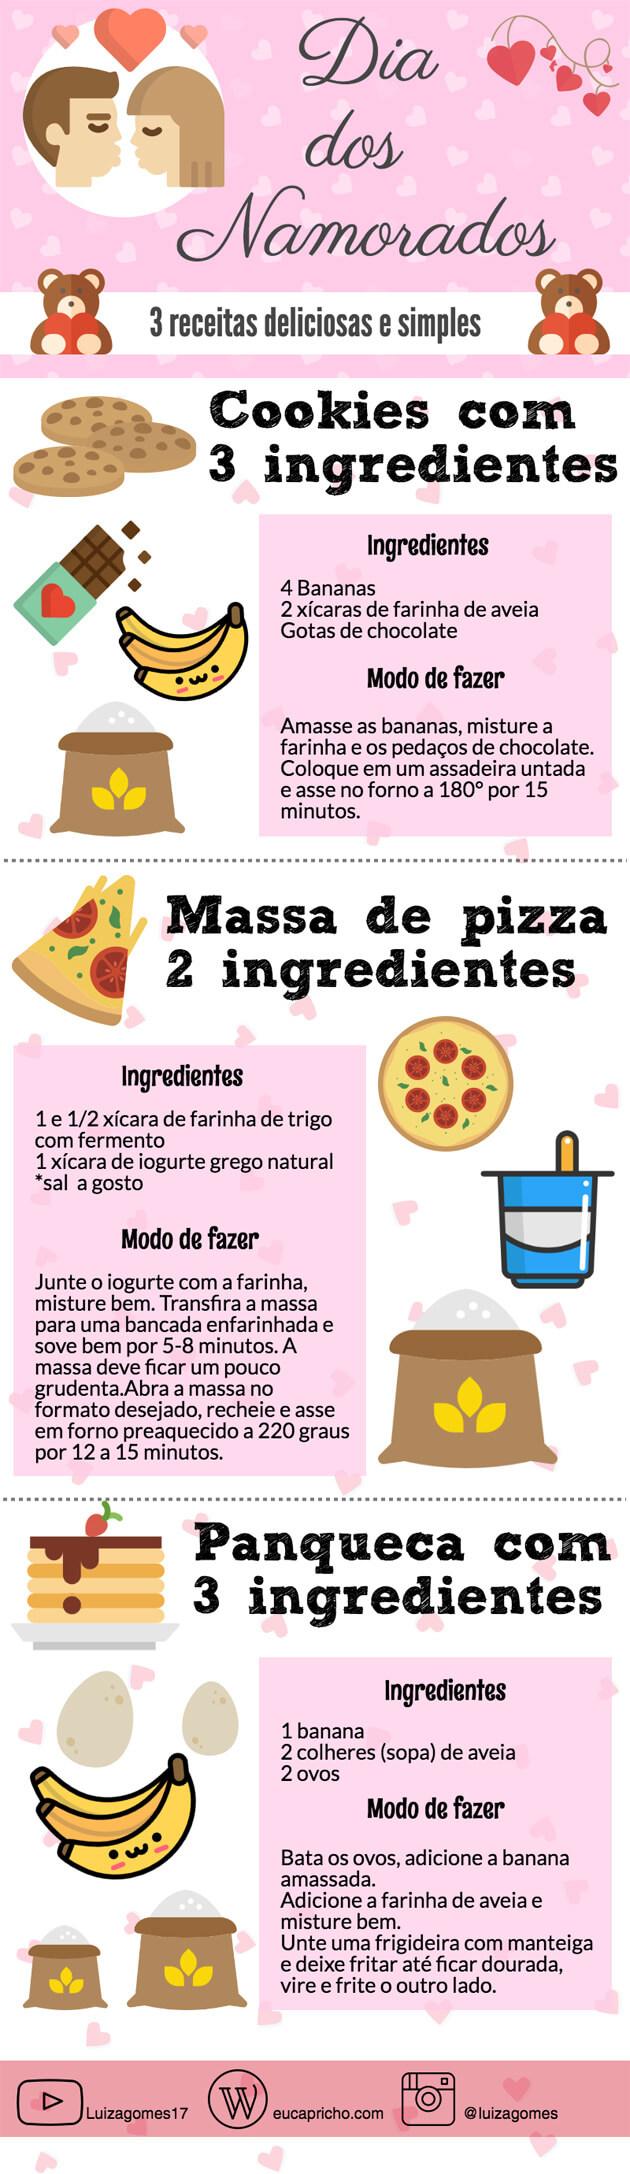 Receitas fáceis para o Dia dos Namorados eucapricho luiza gomes cookie 3 ingredientes panqueca 3 ingredientes massa de pizza 2 ingredientes